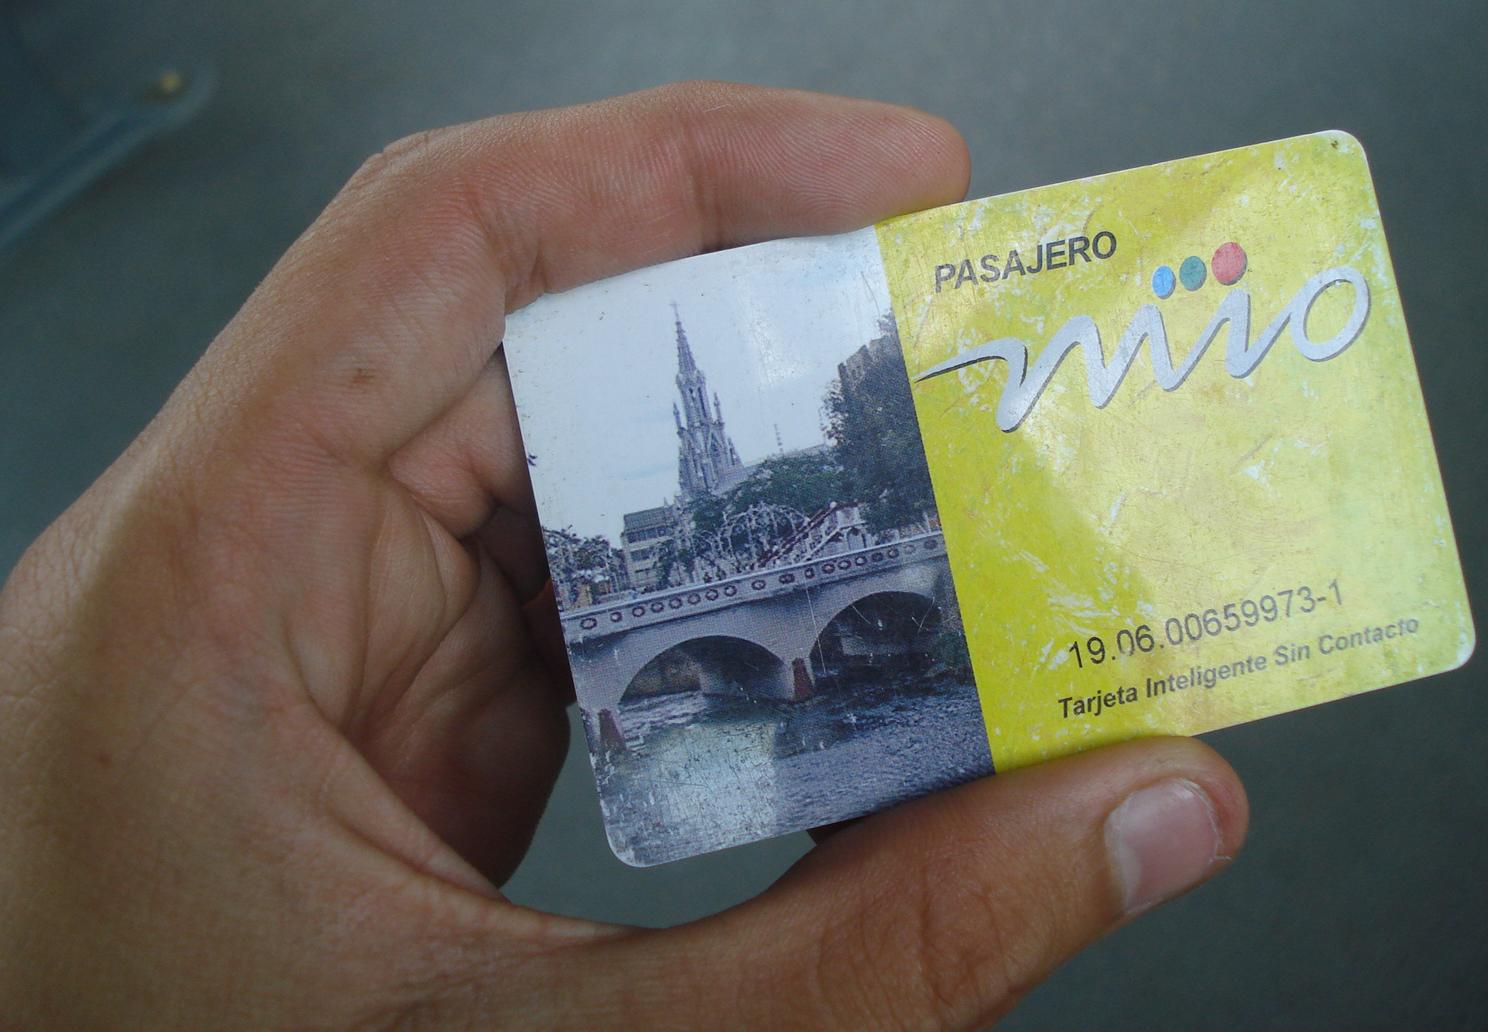 Metrocali pierde $40 millones diariamente